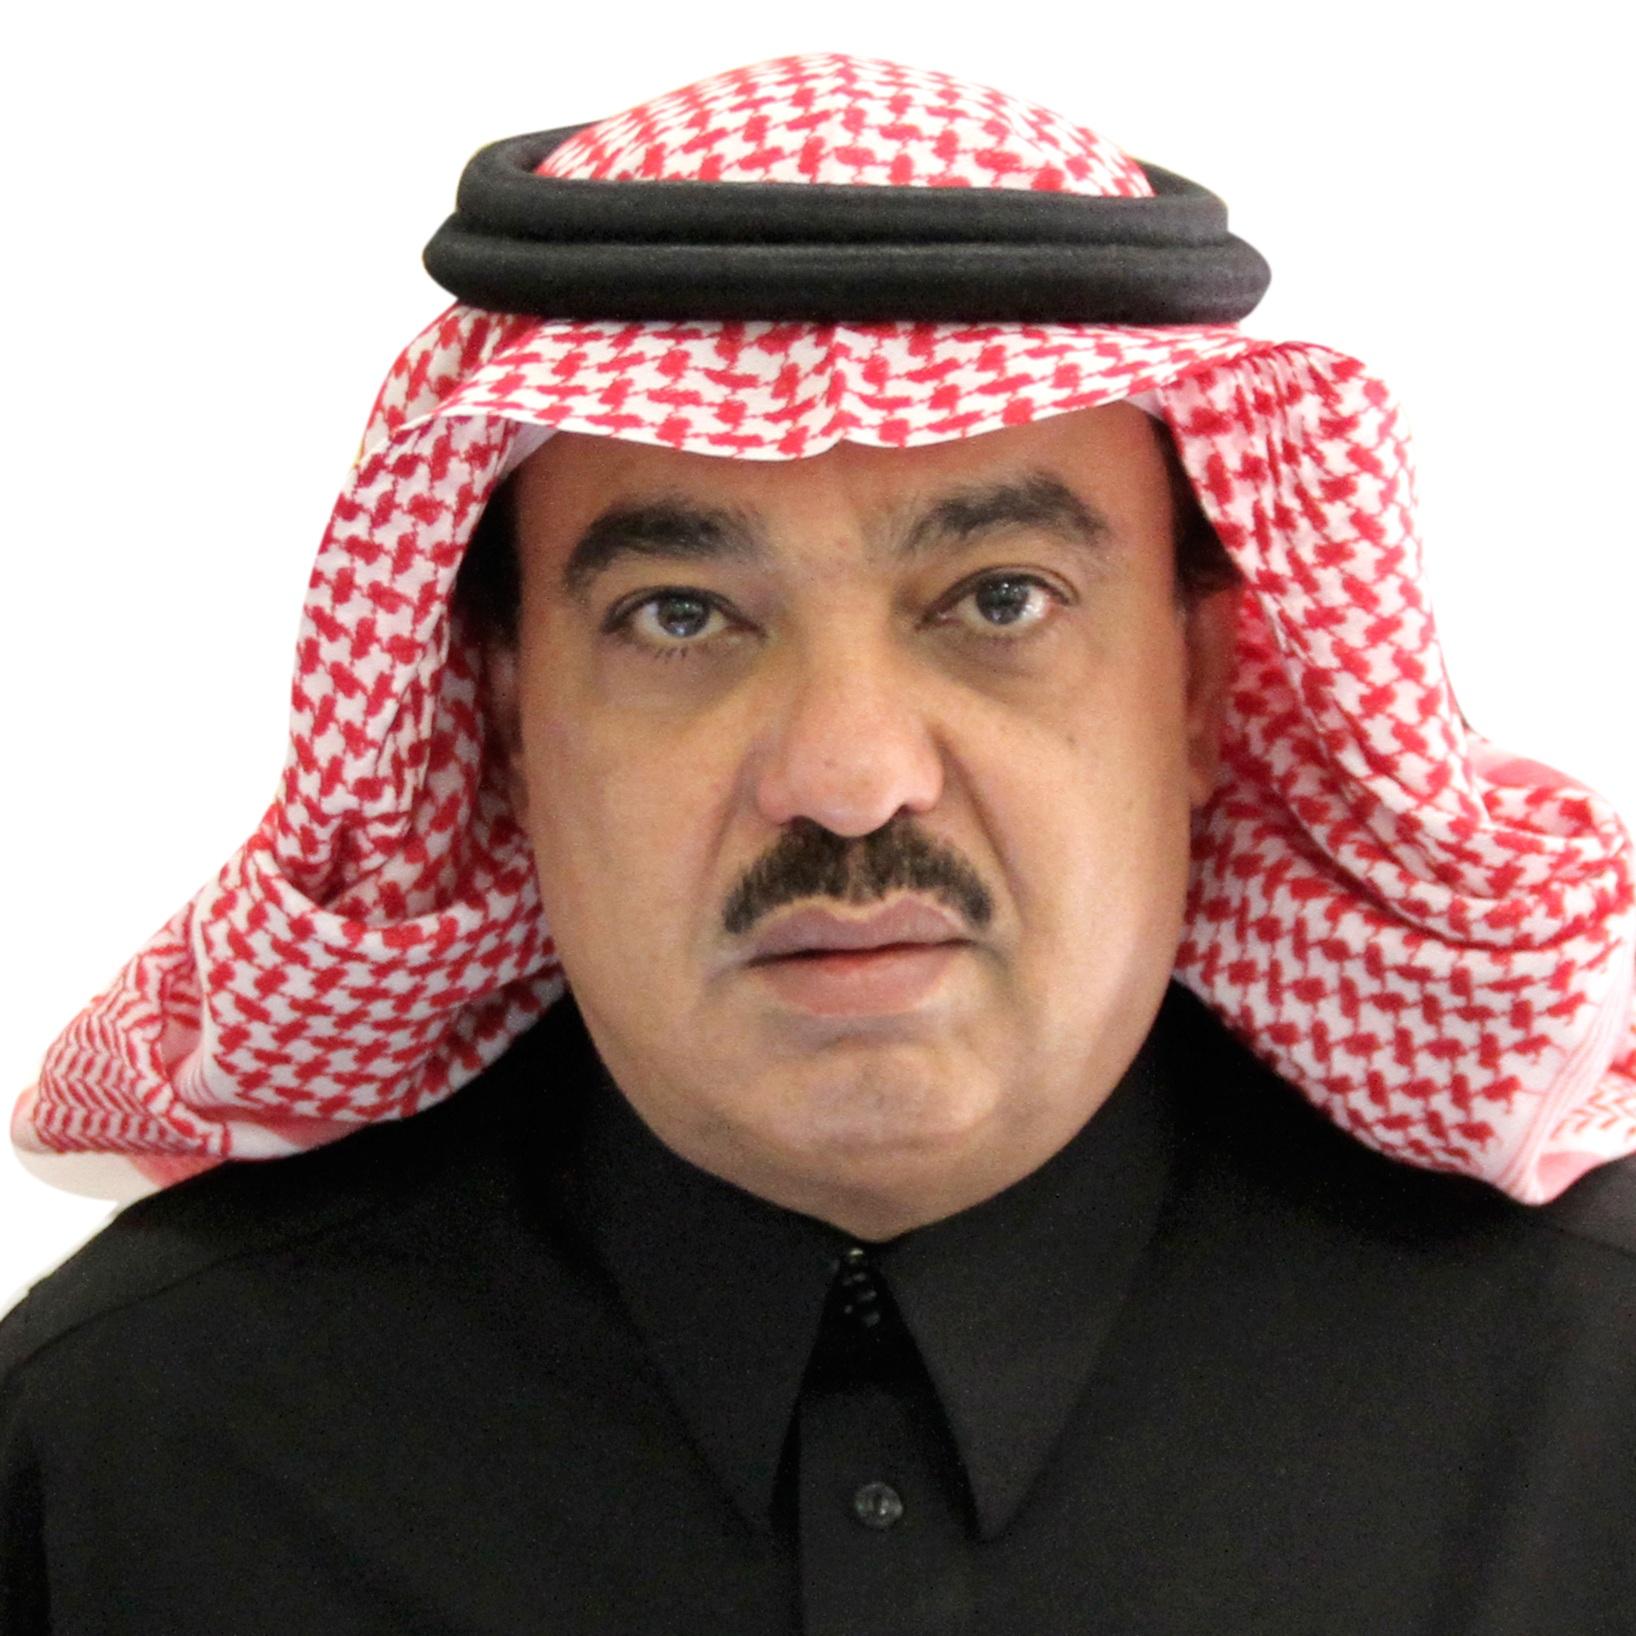 Faisal Shaheen